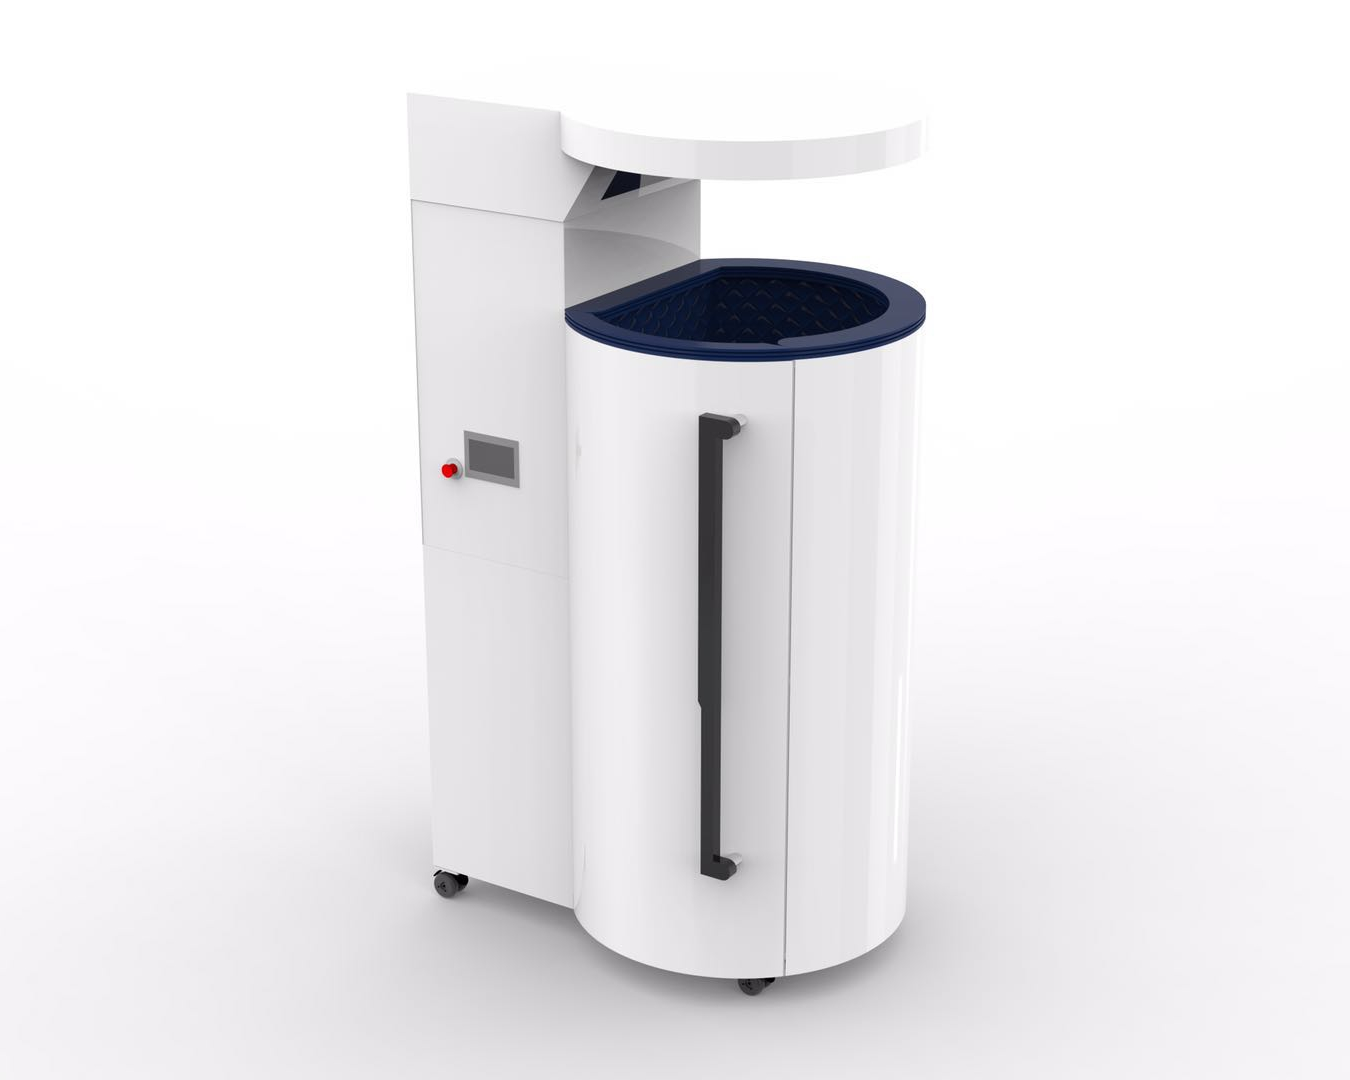 Medical Cryogenic Equipment Cryotherapy Device Cryo Chamber Cryosauna China  - Buy Cryo Chamber,Cryosauna Cryotherapy,Cryo Cabin Sauna Product on  Alibaba.com